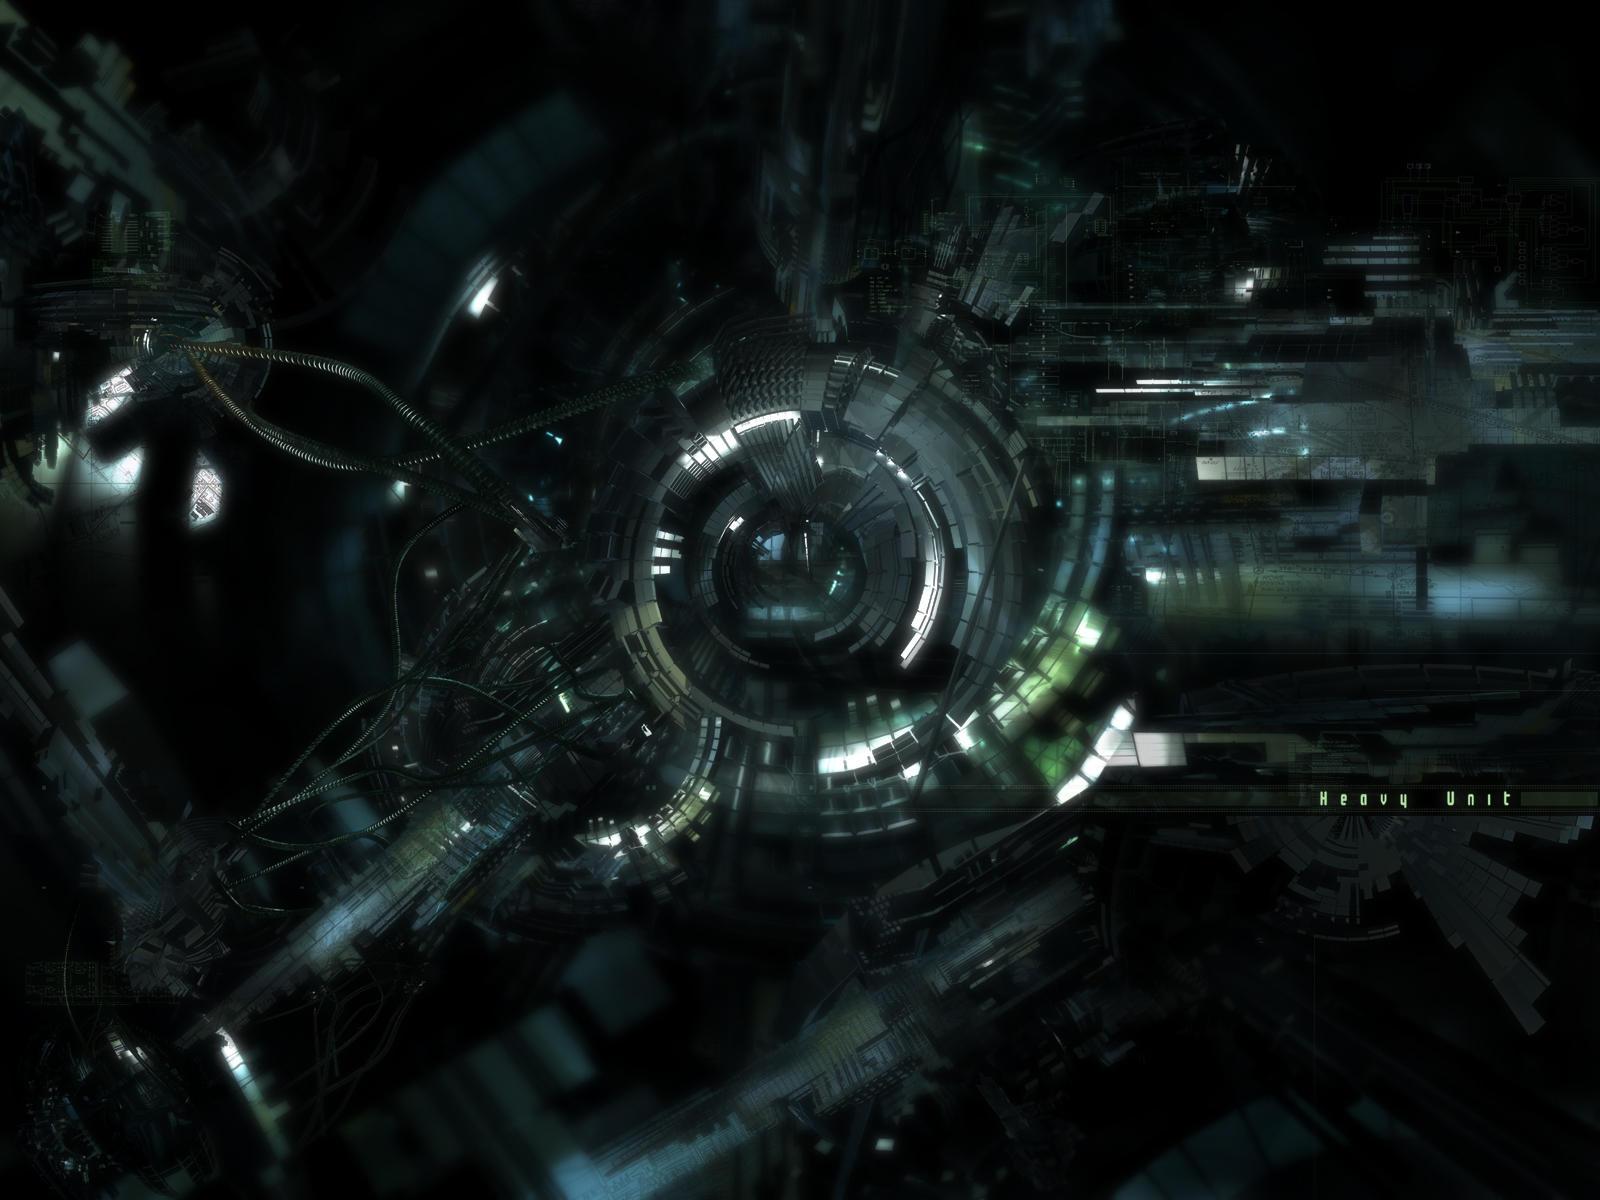 Heavy Unit by SeRHeLL